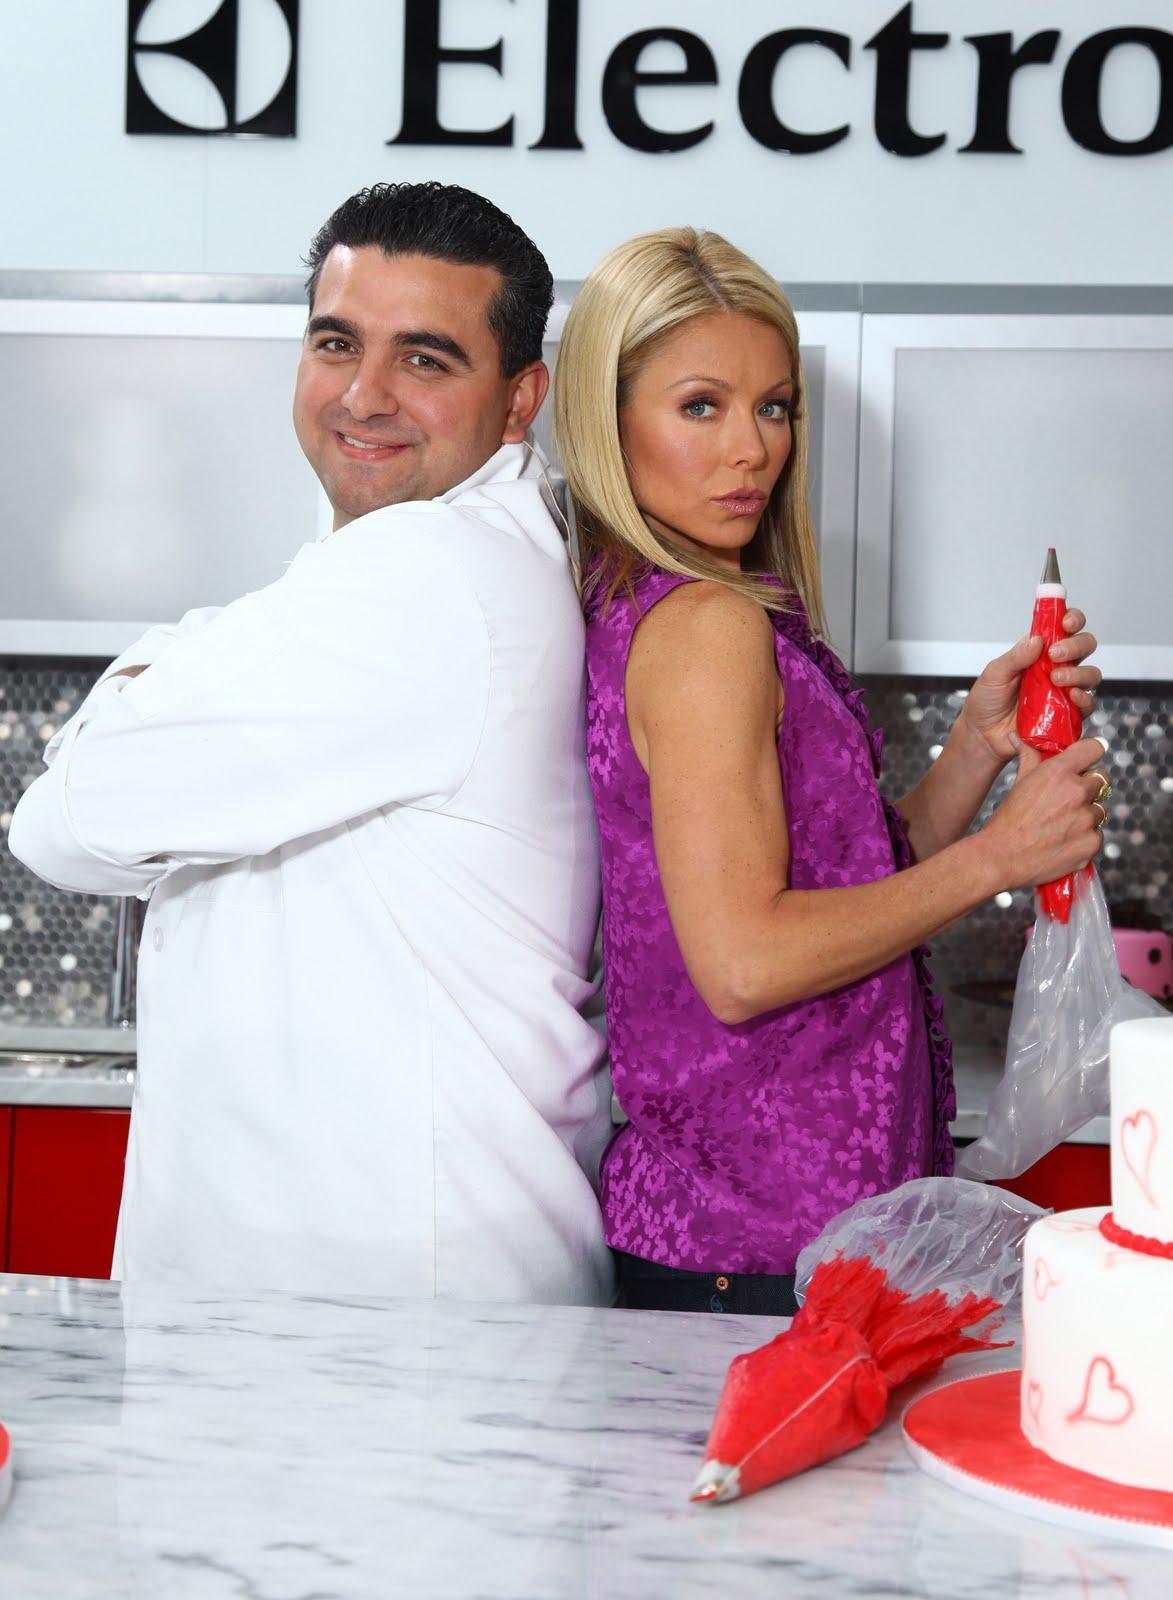 [Cake+Boss+and+Kelly+Ripa]